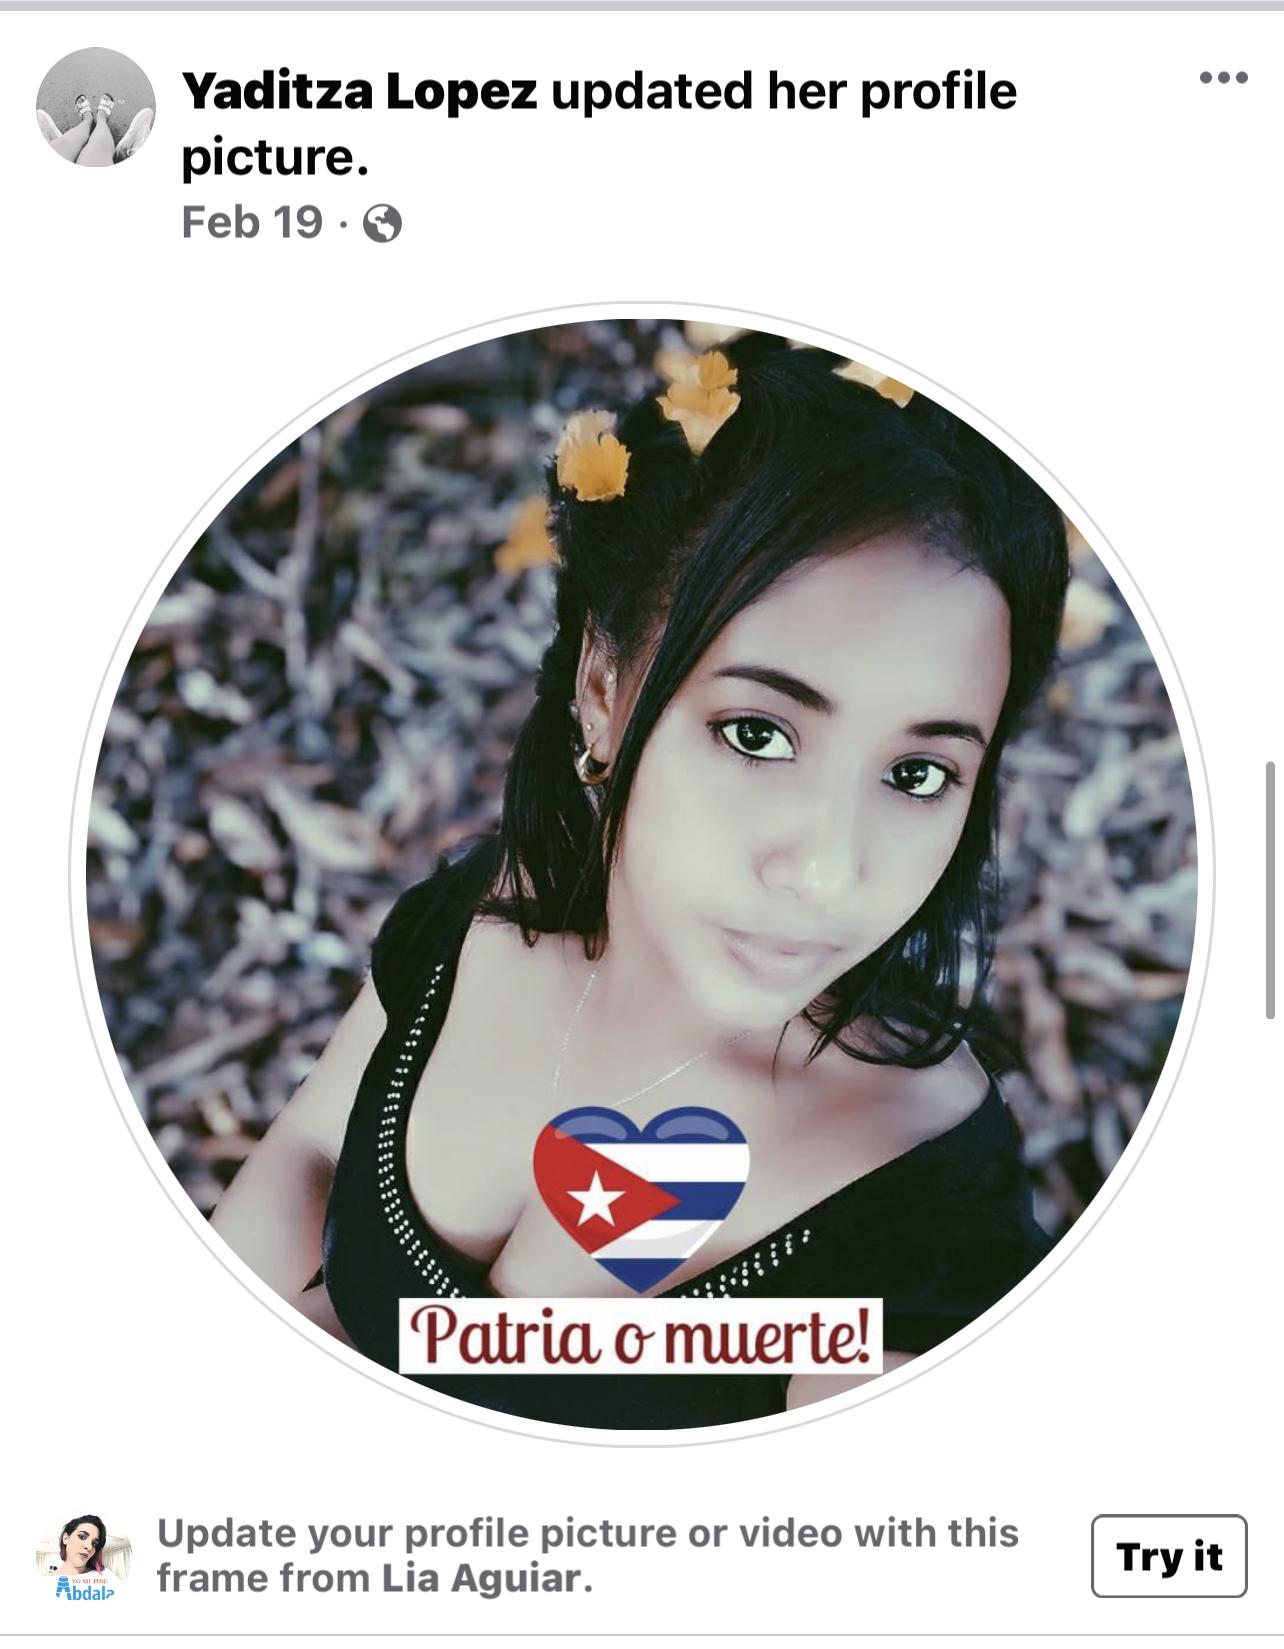 Yaditza Lopez